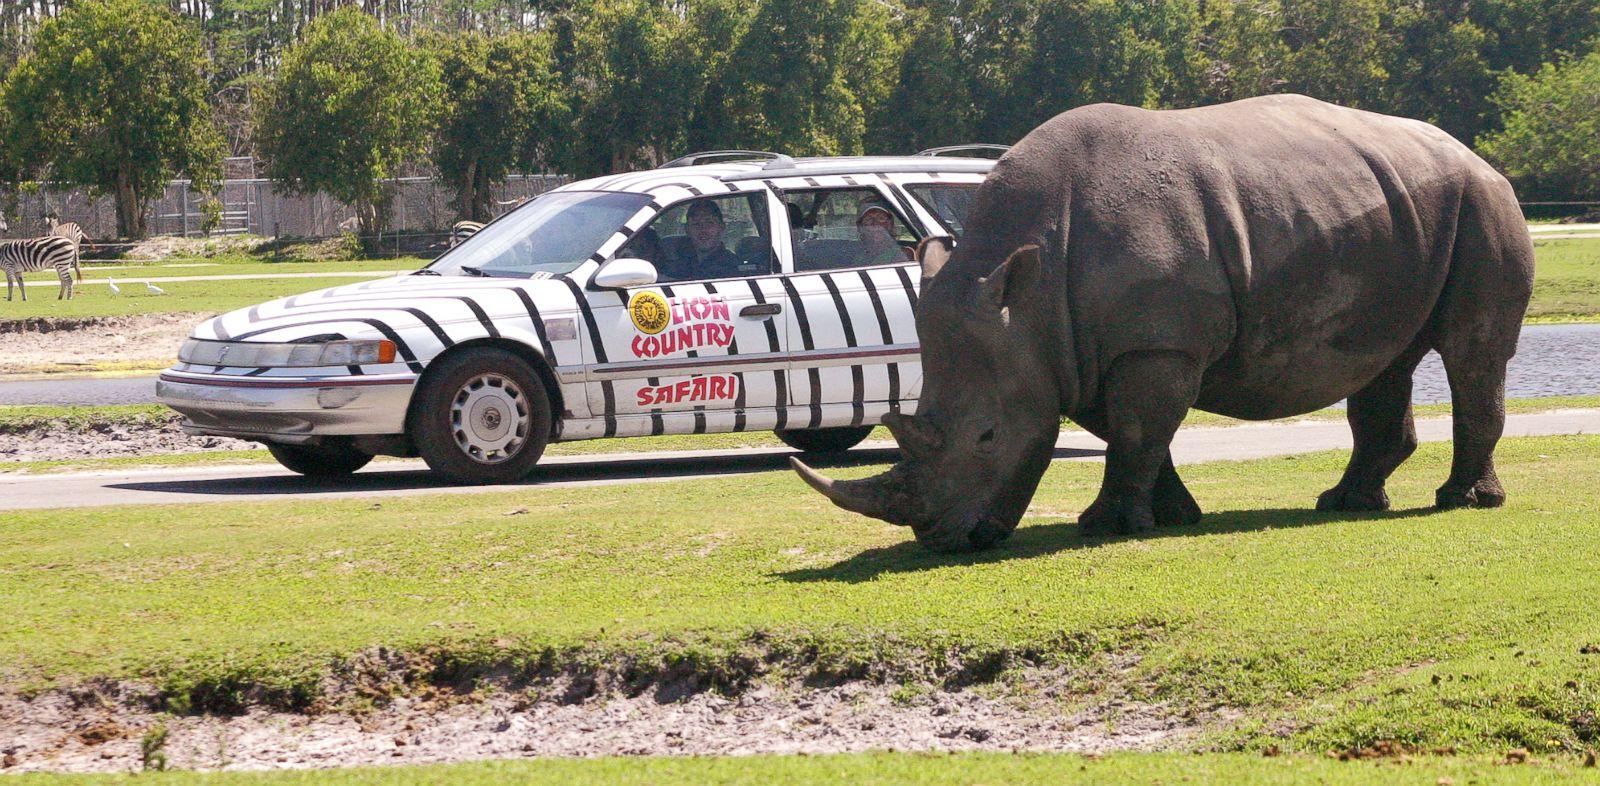 PHOTO: A rhinoceros is seen at Lion County Safari in Loxahatchee, Fla.